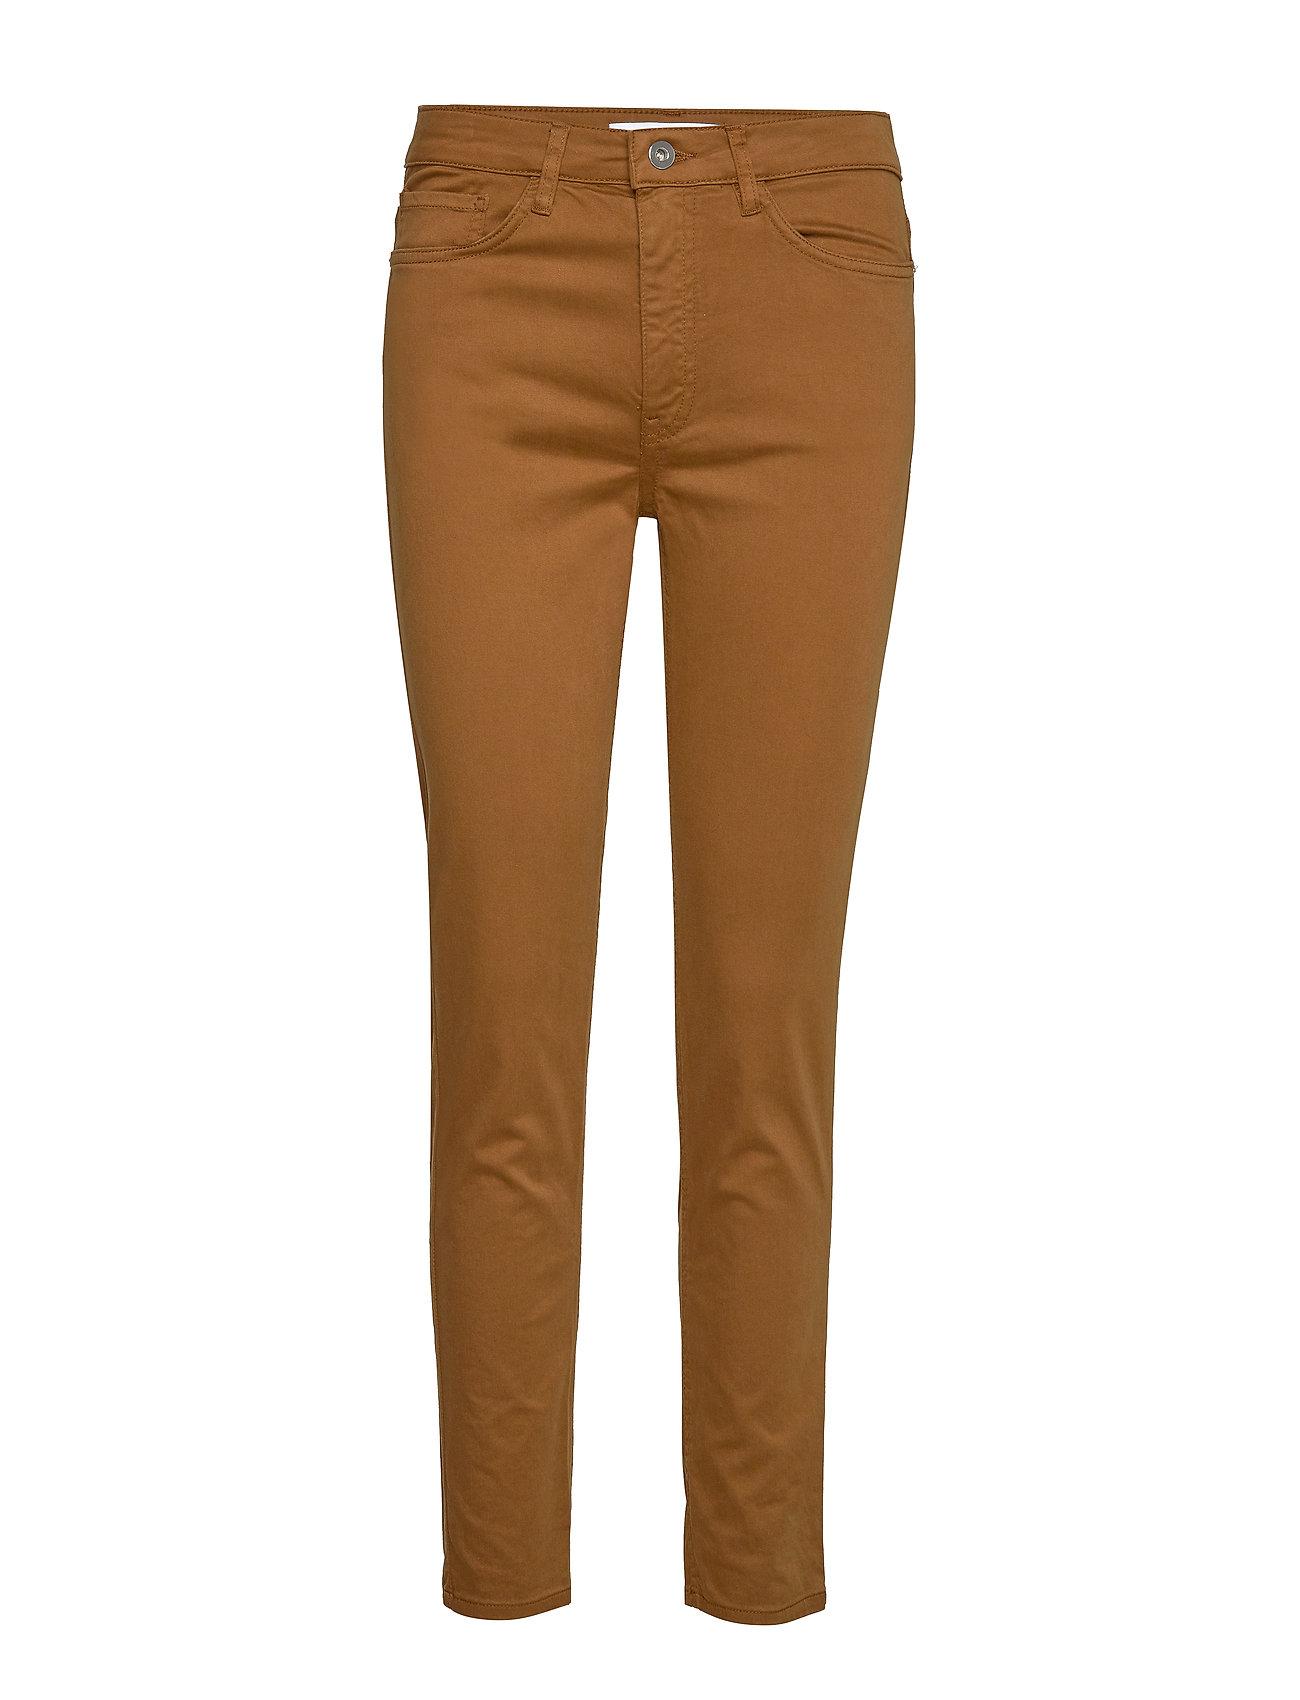 Mango Straight cotton trousers - MEDIUM BROWN